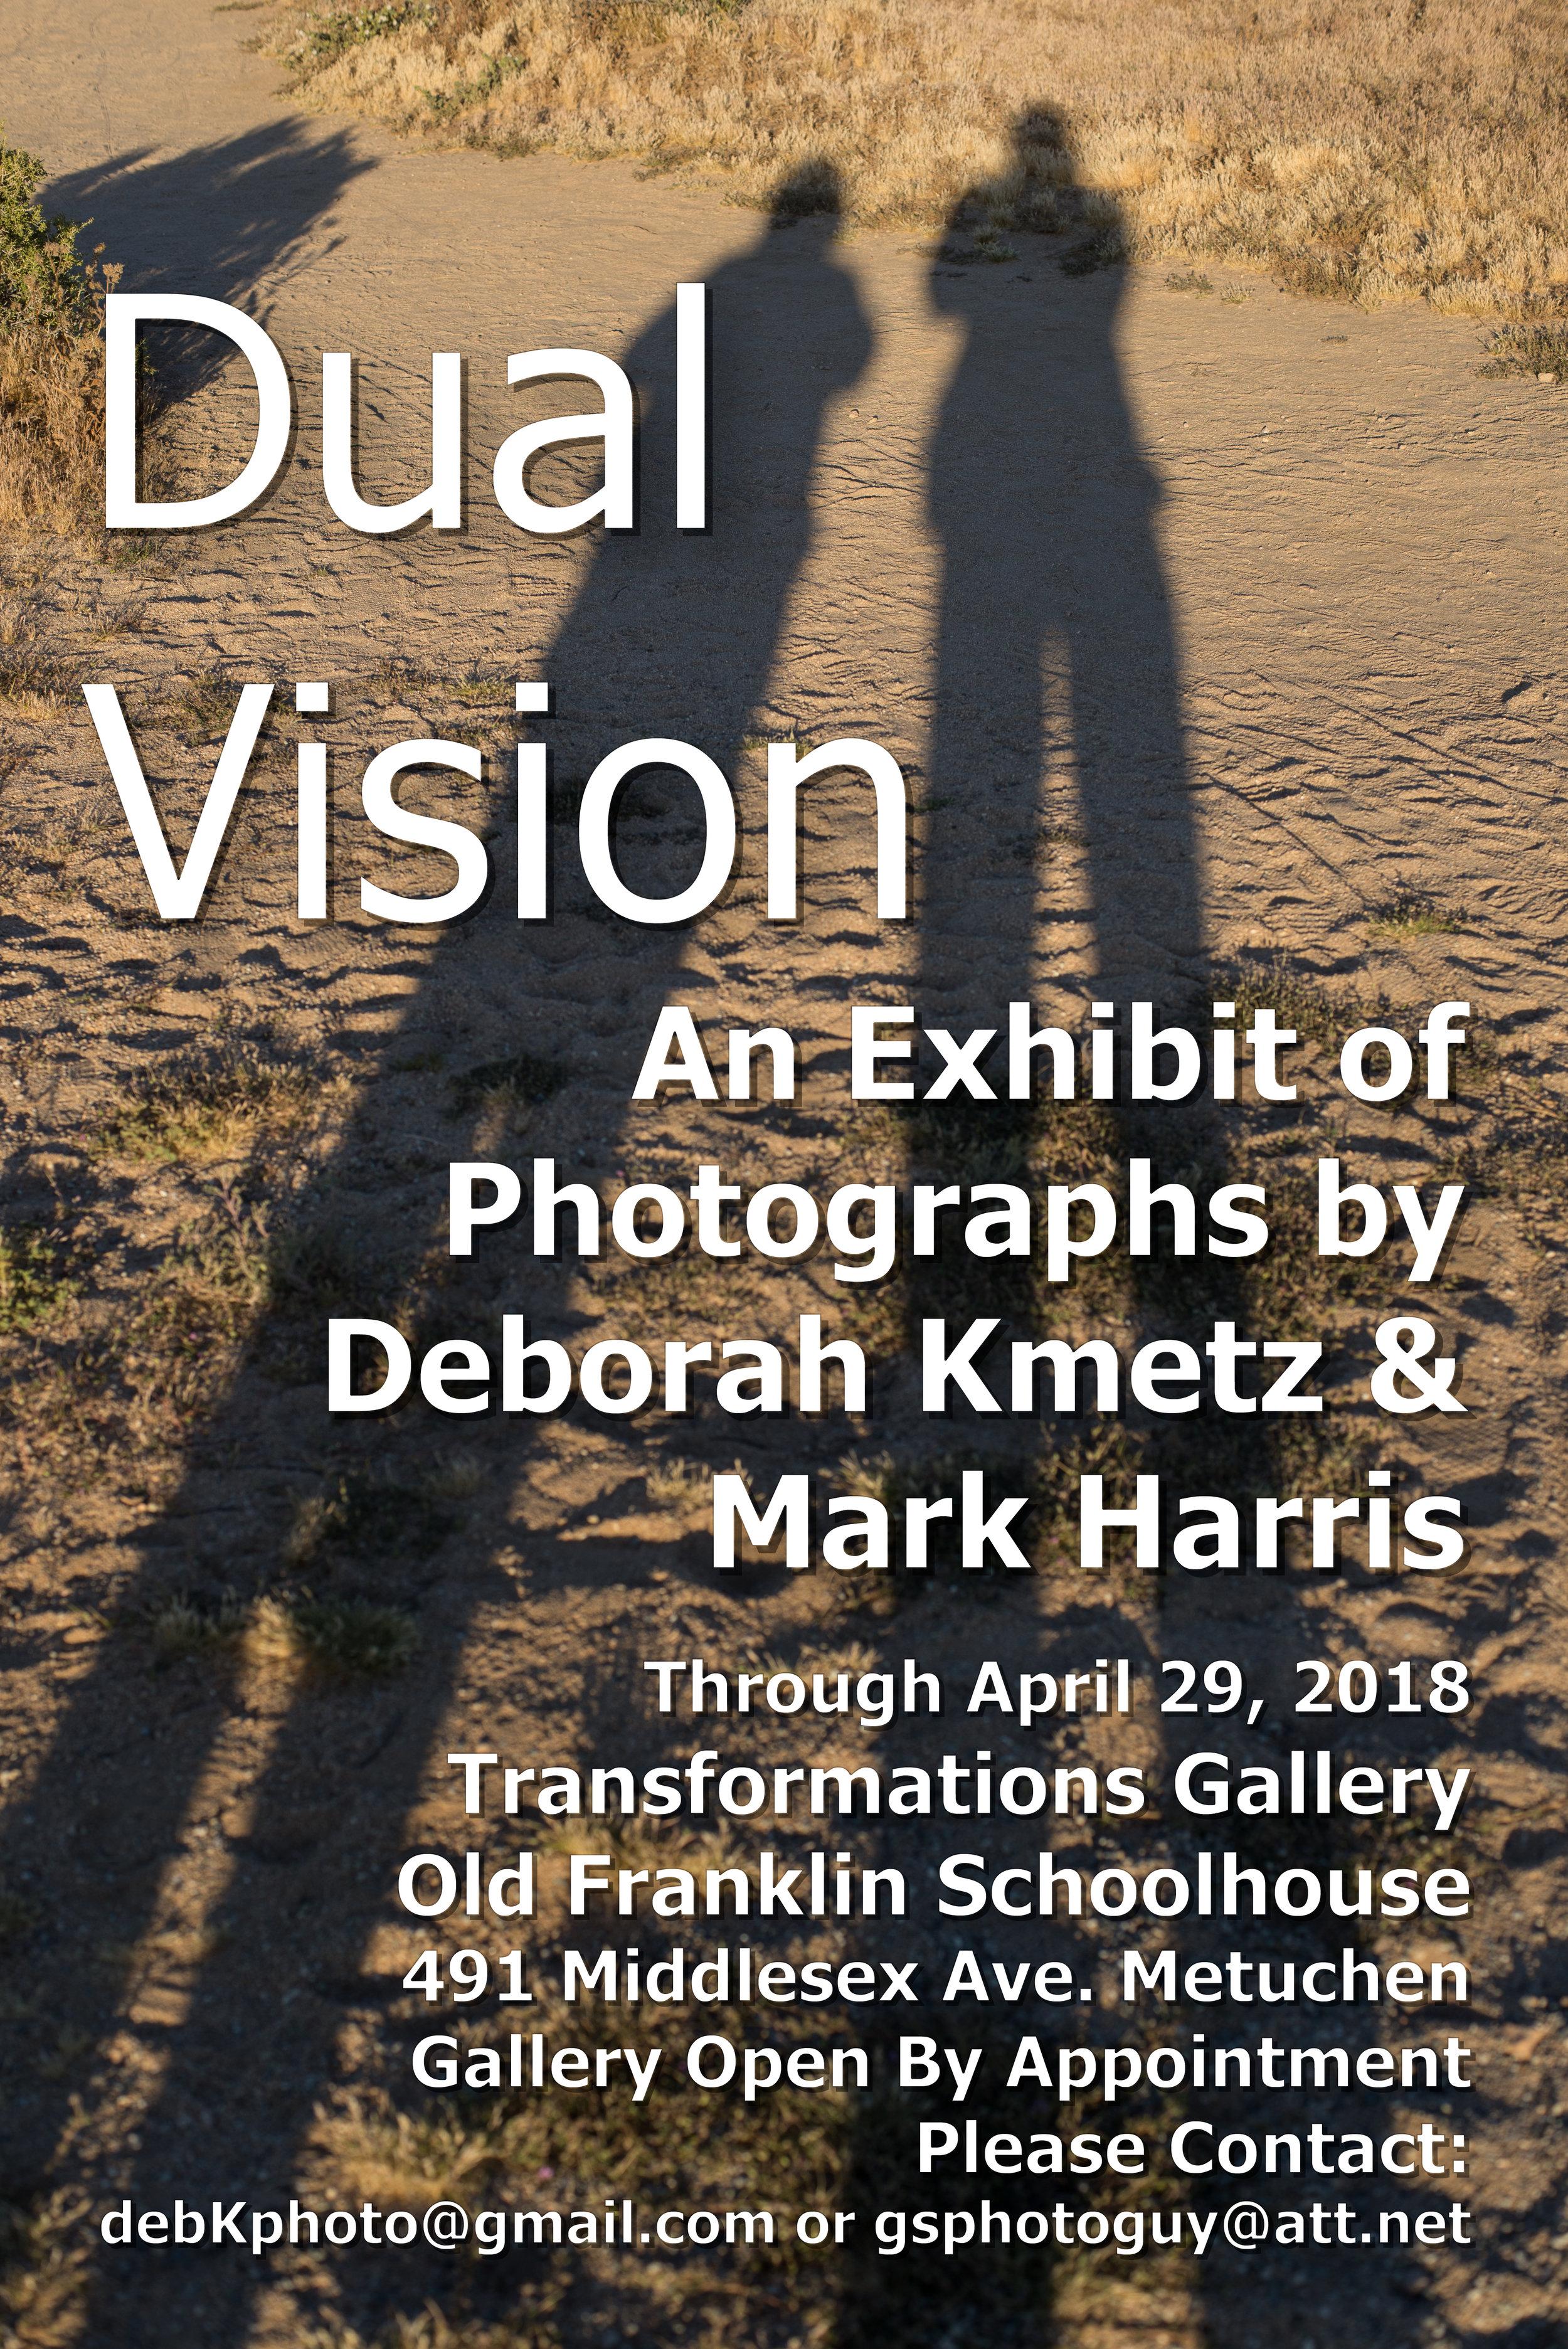 Dual_Vision_post_opening_flyer_1-22-18.jpg